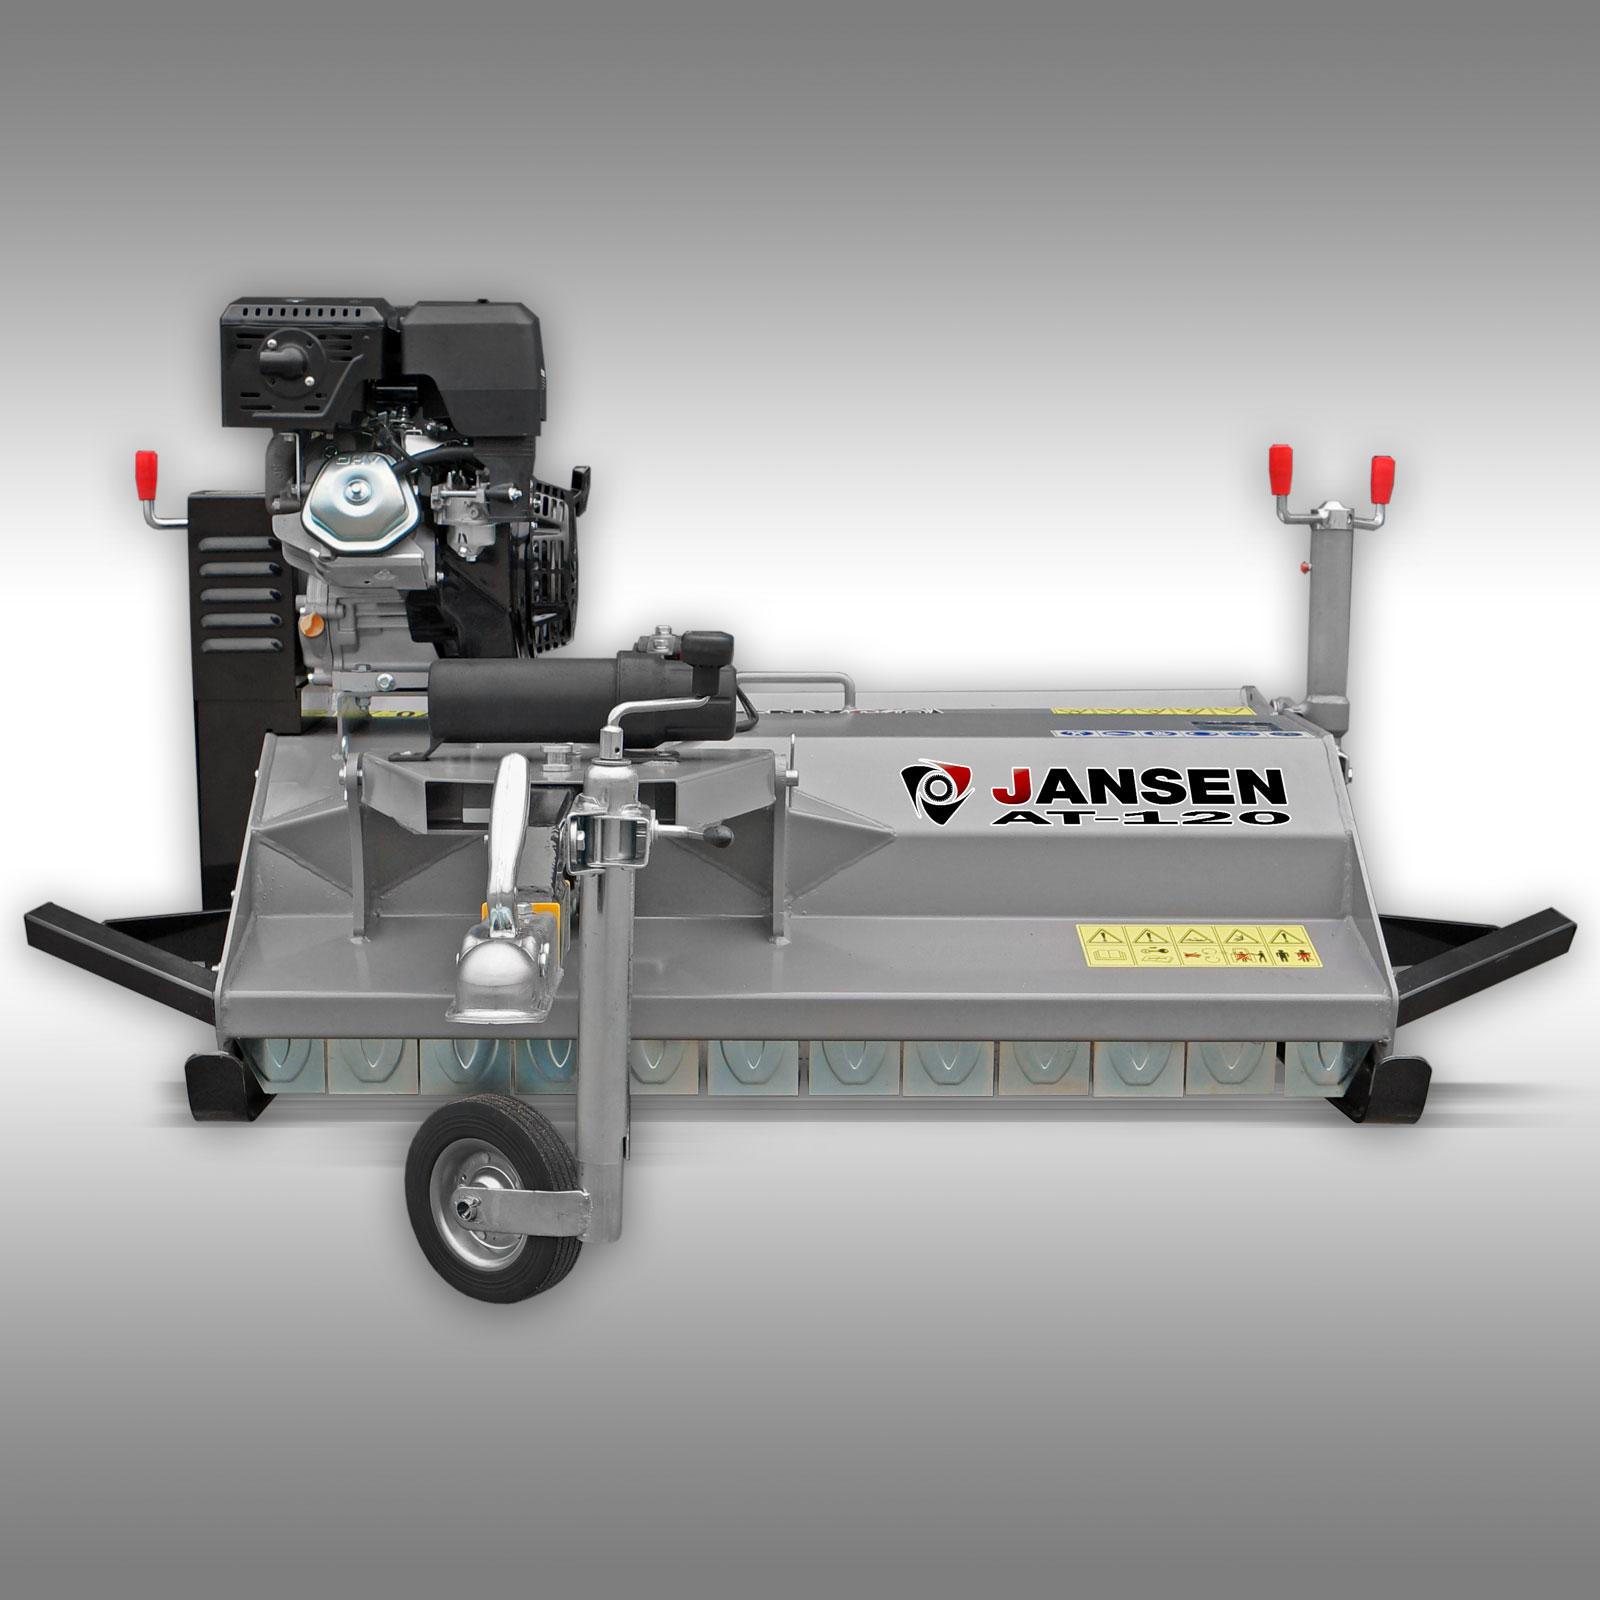 schlegelmulcher jansen at 120 15 ps motor quad atv. Black Bedroom Furniture Sets. Home Design Ideas